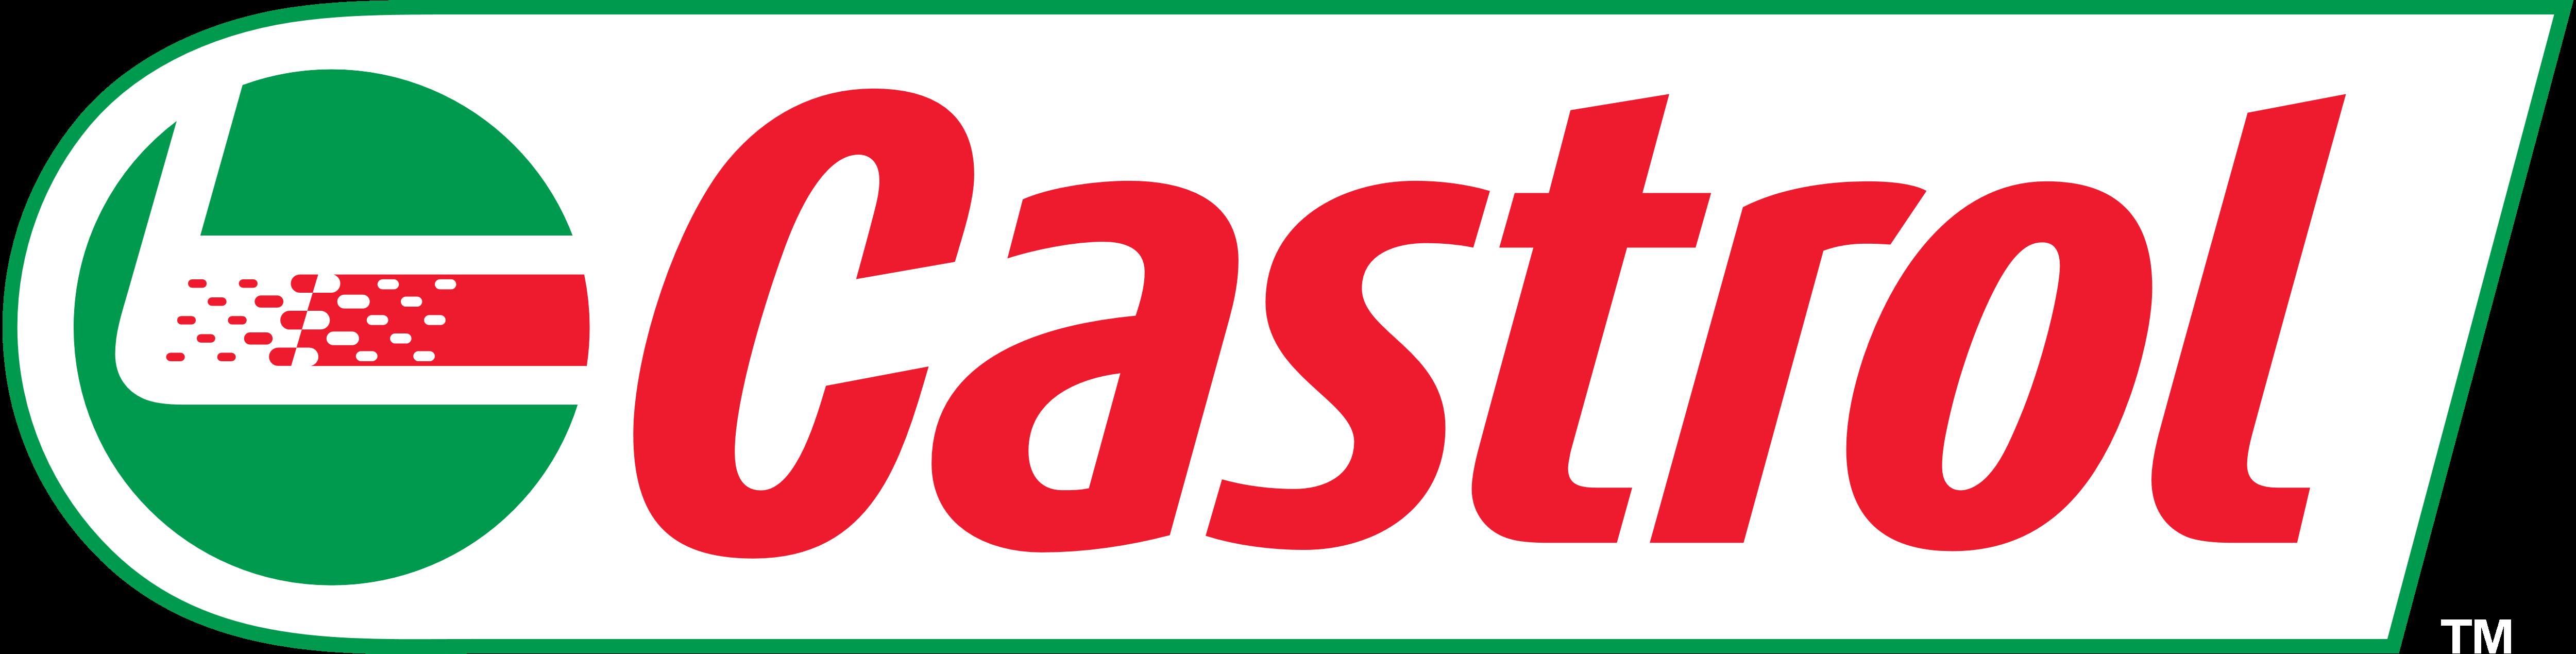 Castrol logo 2D transparent